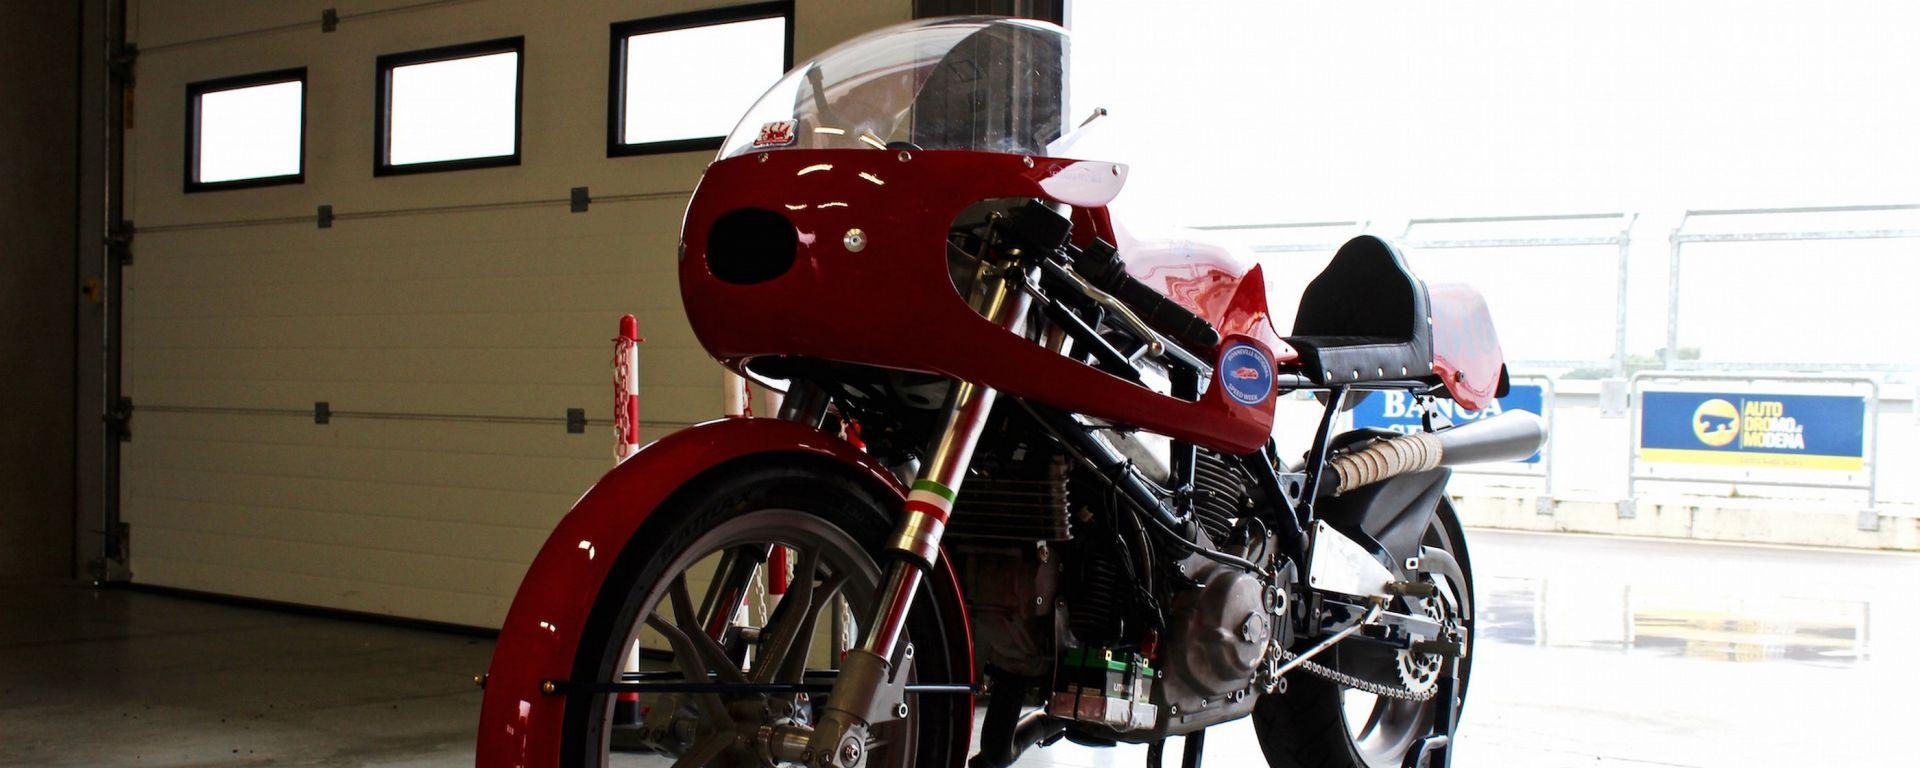 Bonneville Speed Week 2016: nello Utah anche un team italiano